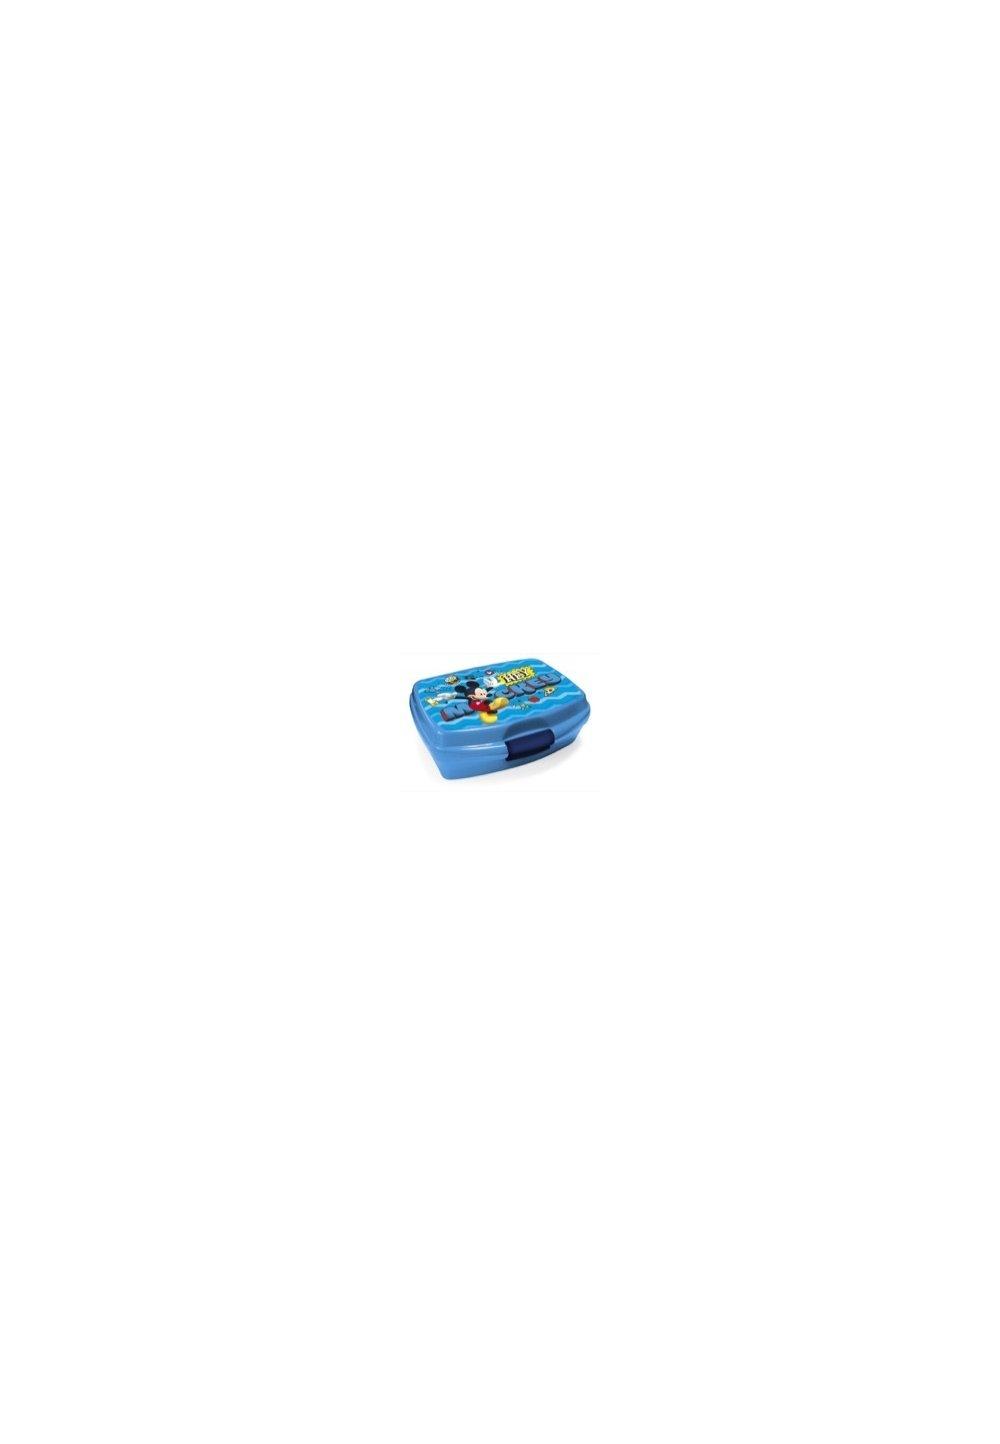 Cutie alimentara, albastra, Hey Mickey imagine